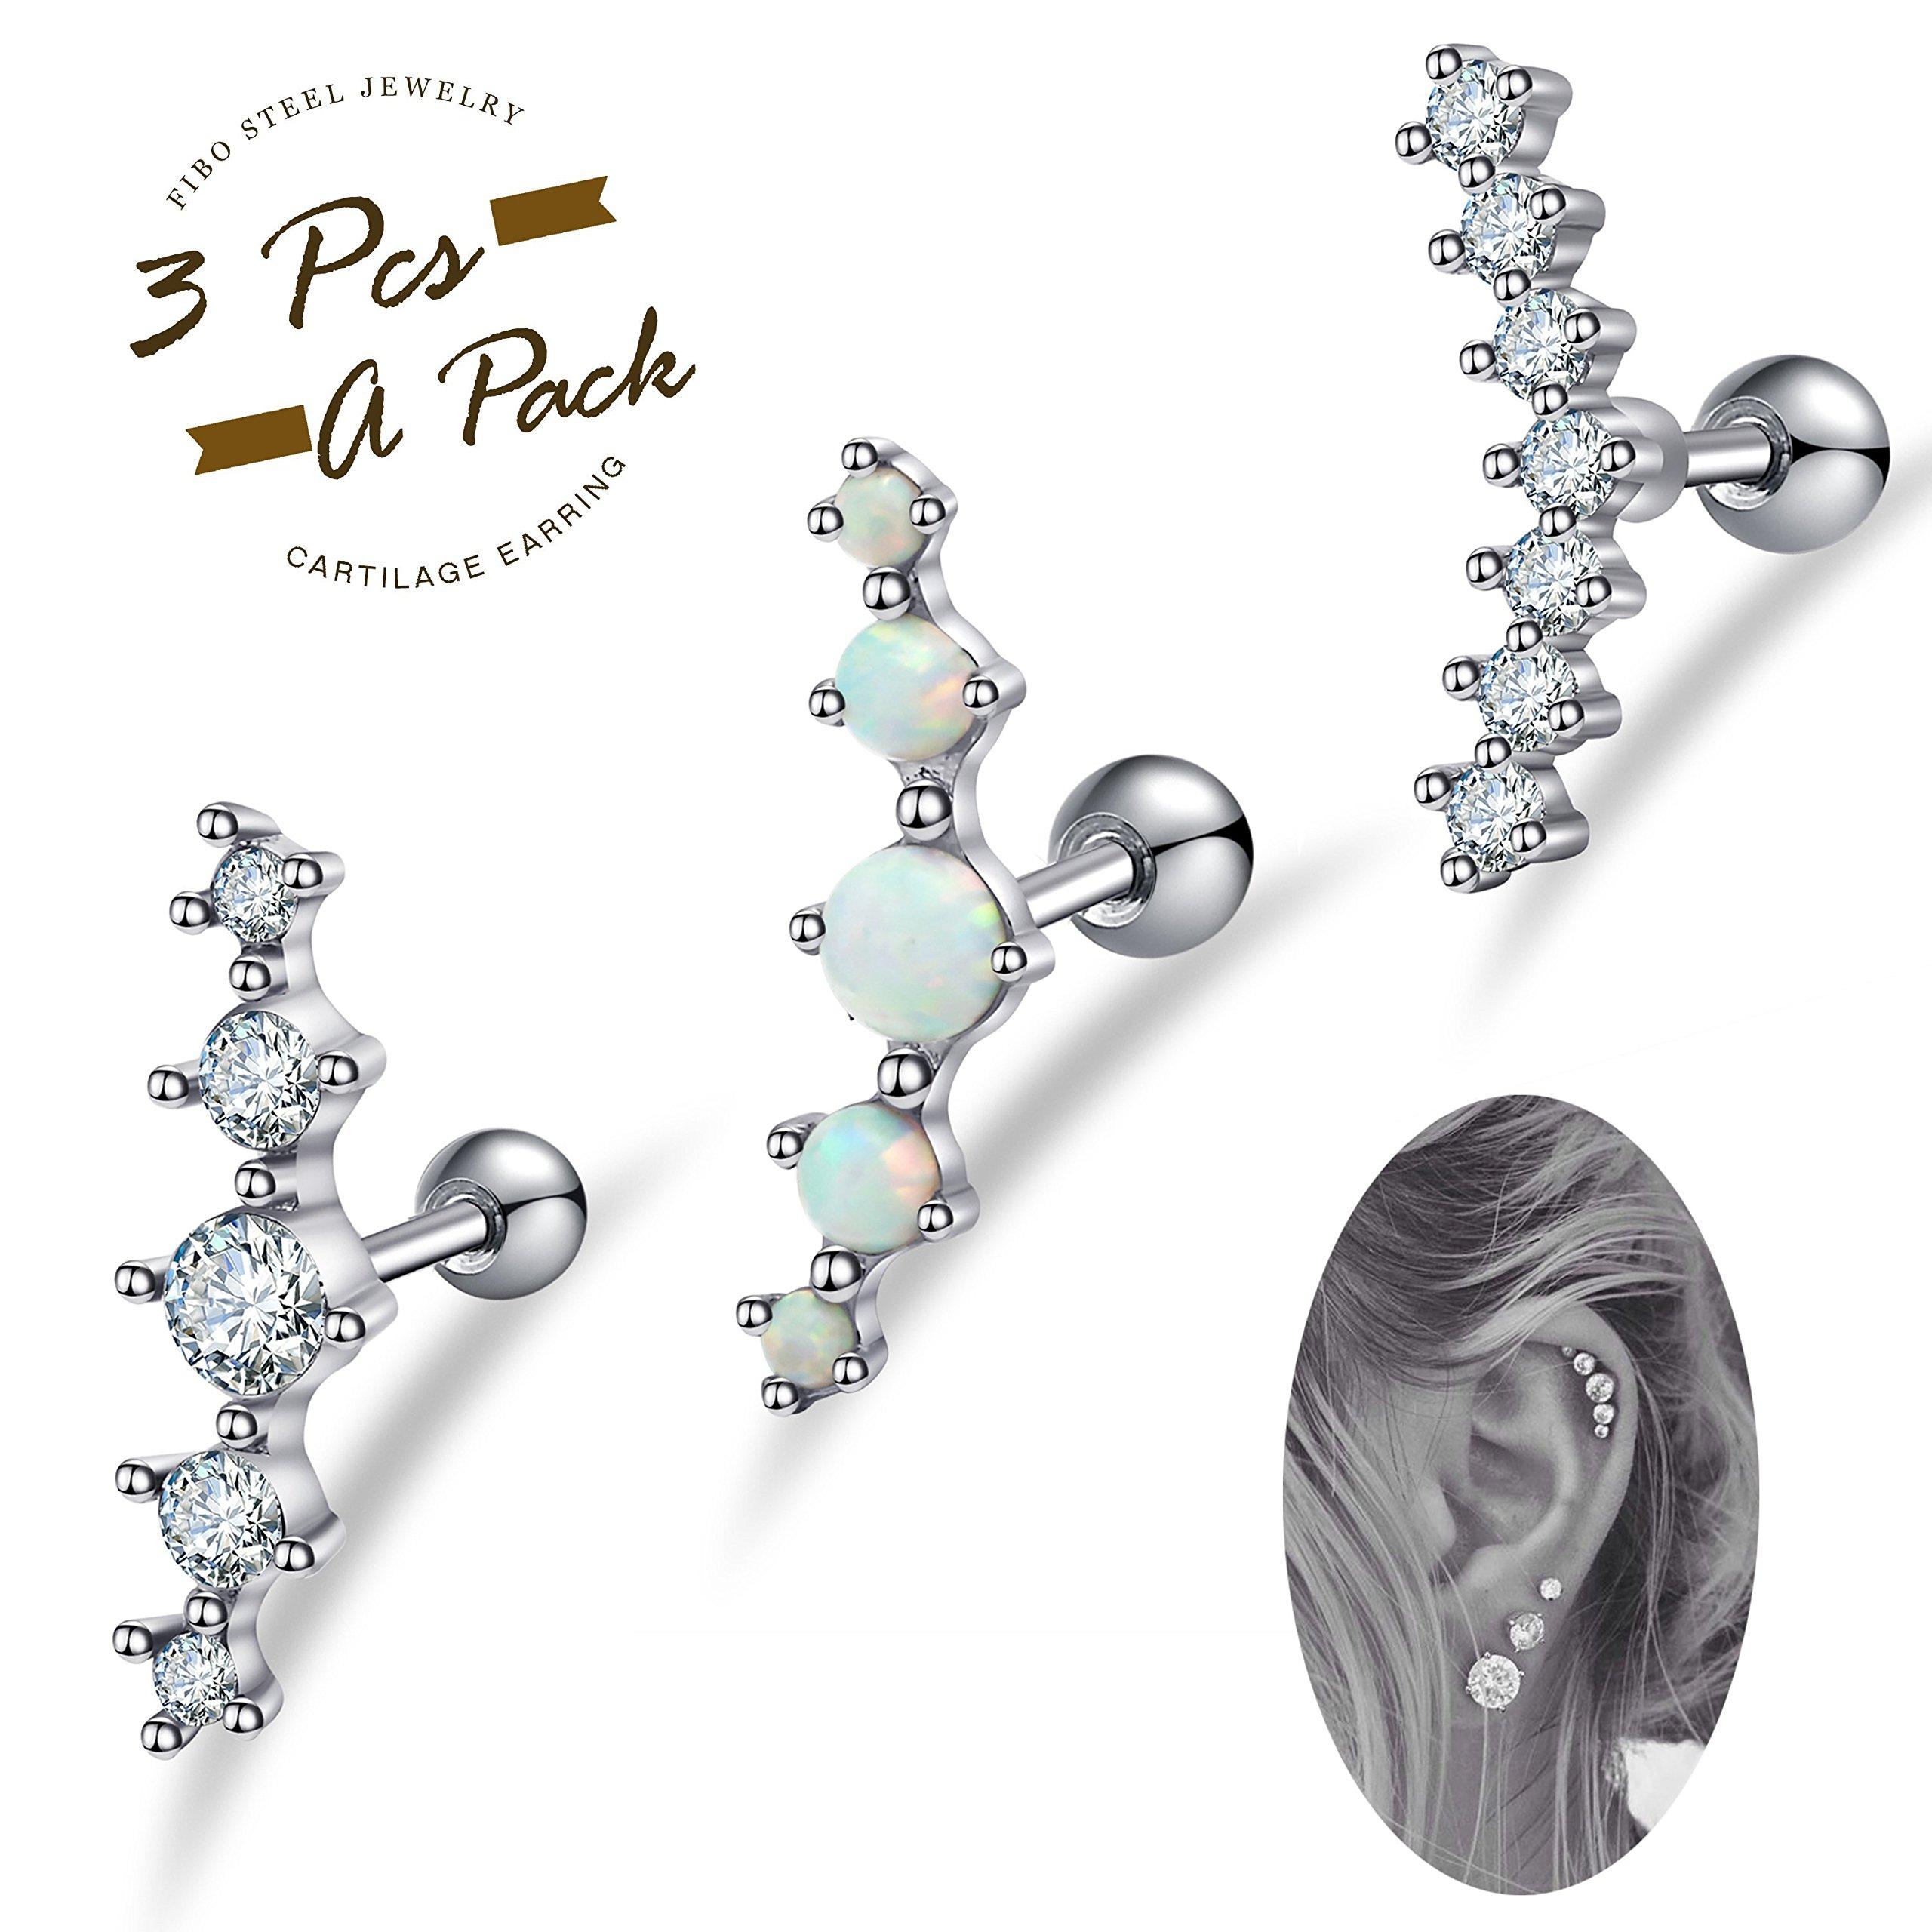 FIBO STEEL 3 Pcs 16G Stainless Steel Cartilage CZ Stud Earrings for Women Girls Helix Conch Daith Piercing Jewelry Set by FIBO STEEL